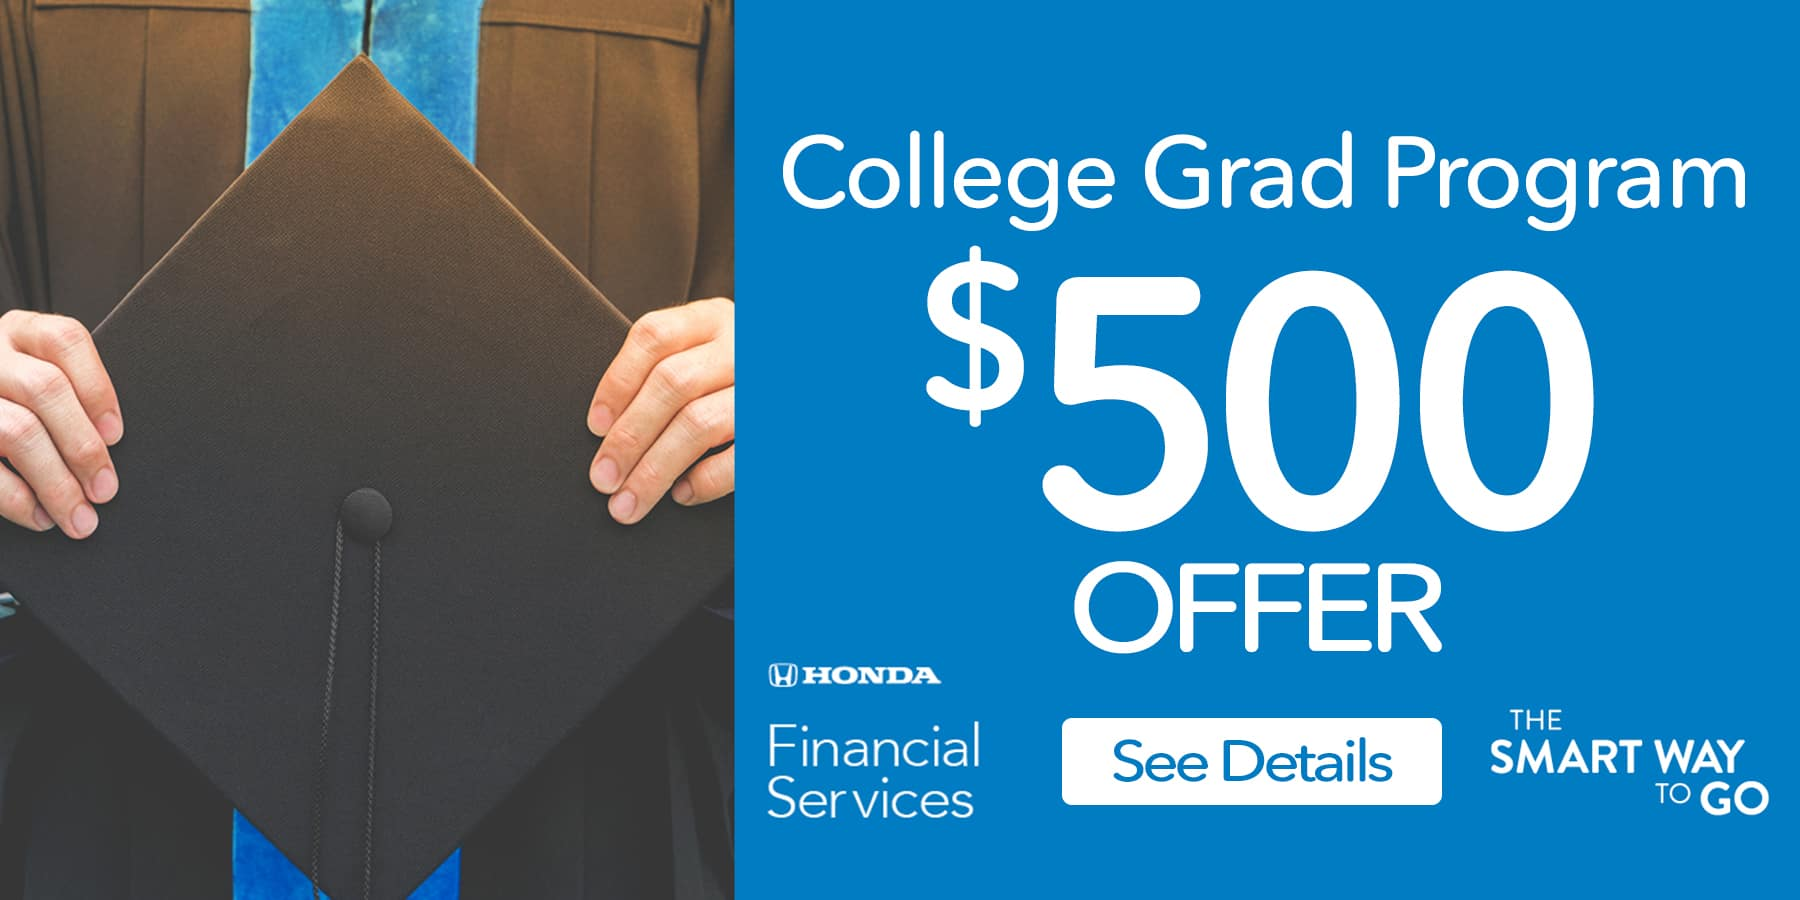 Honda College Grad